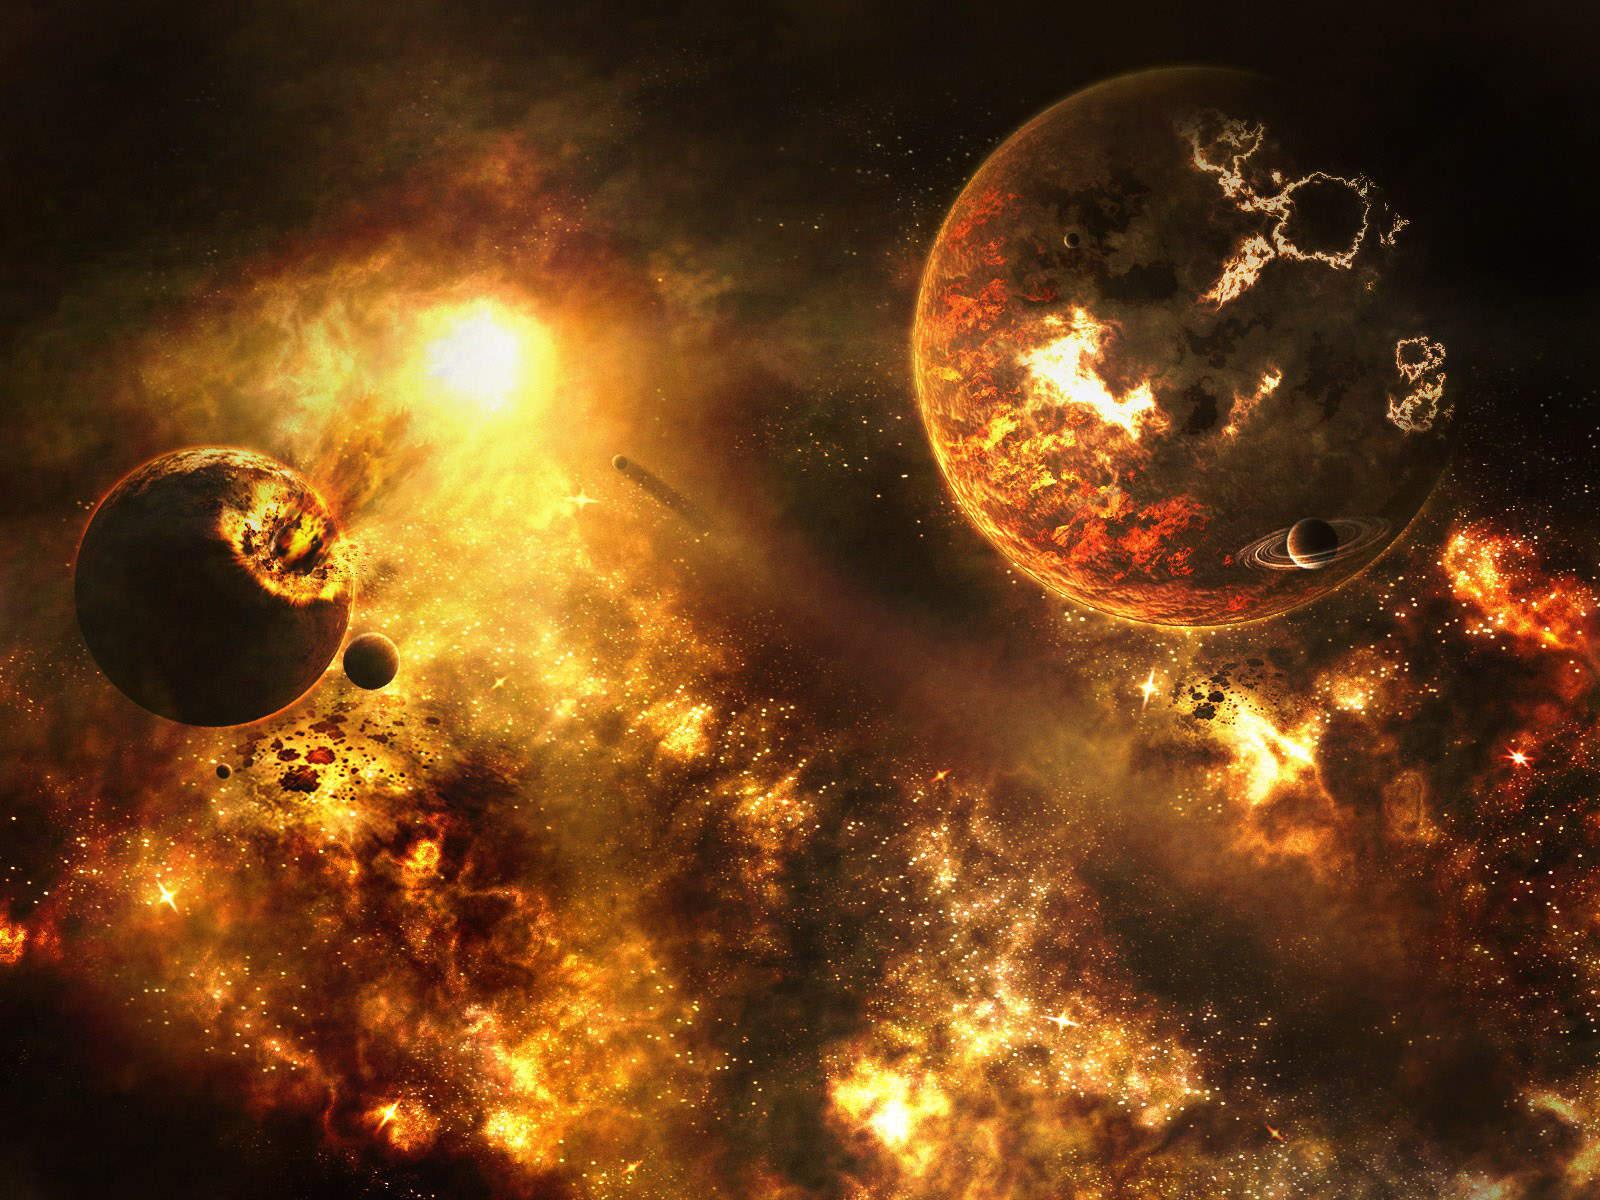 http://2.bp.blogspot.com/-Evwr2SWPiKA/T388s7Iz42I/AAAAAAAAC-c/oxTdjYNFGDY/s1600/burning_universe-normal.jpg